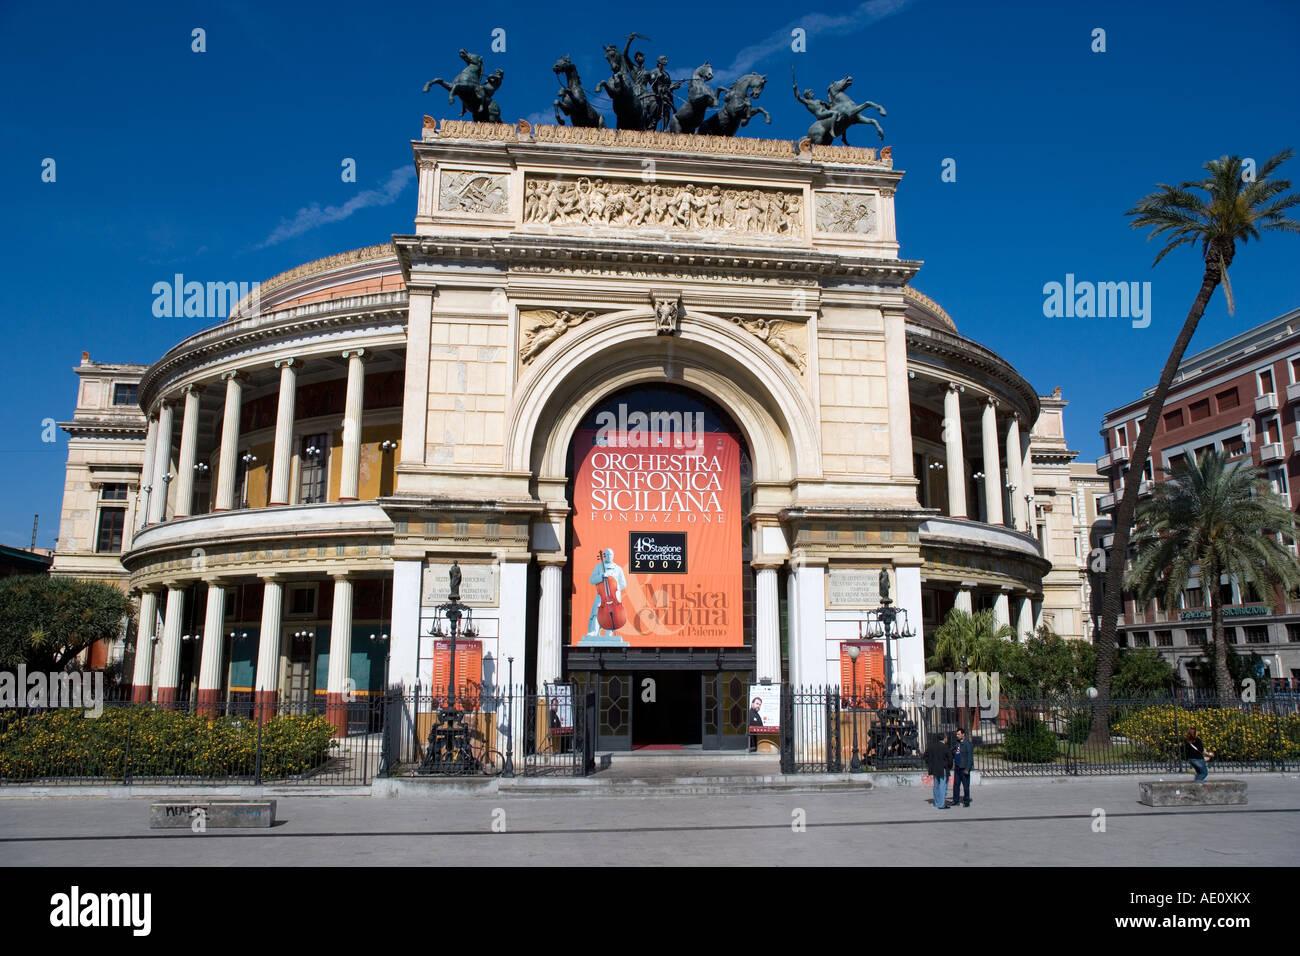 Teatro Politeama Garibaldi Palermo Sicily Italy Stock Photo